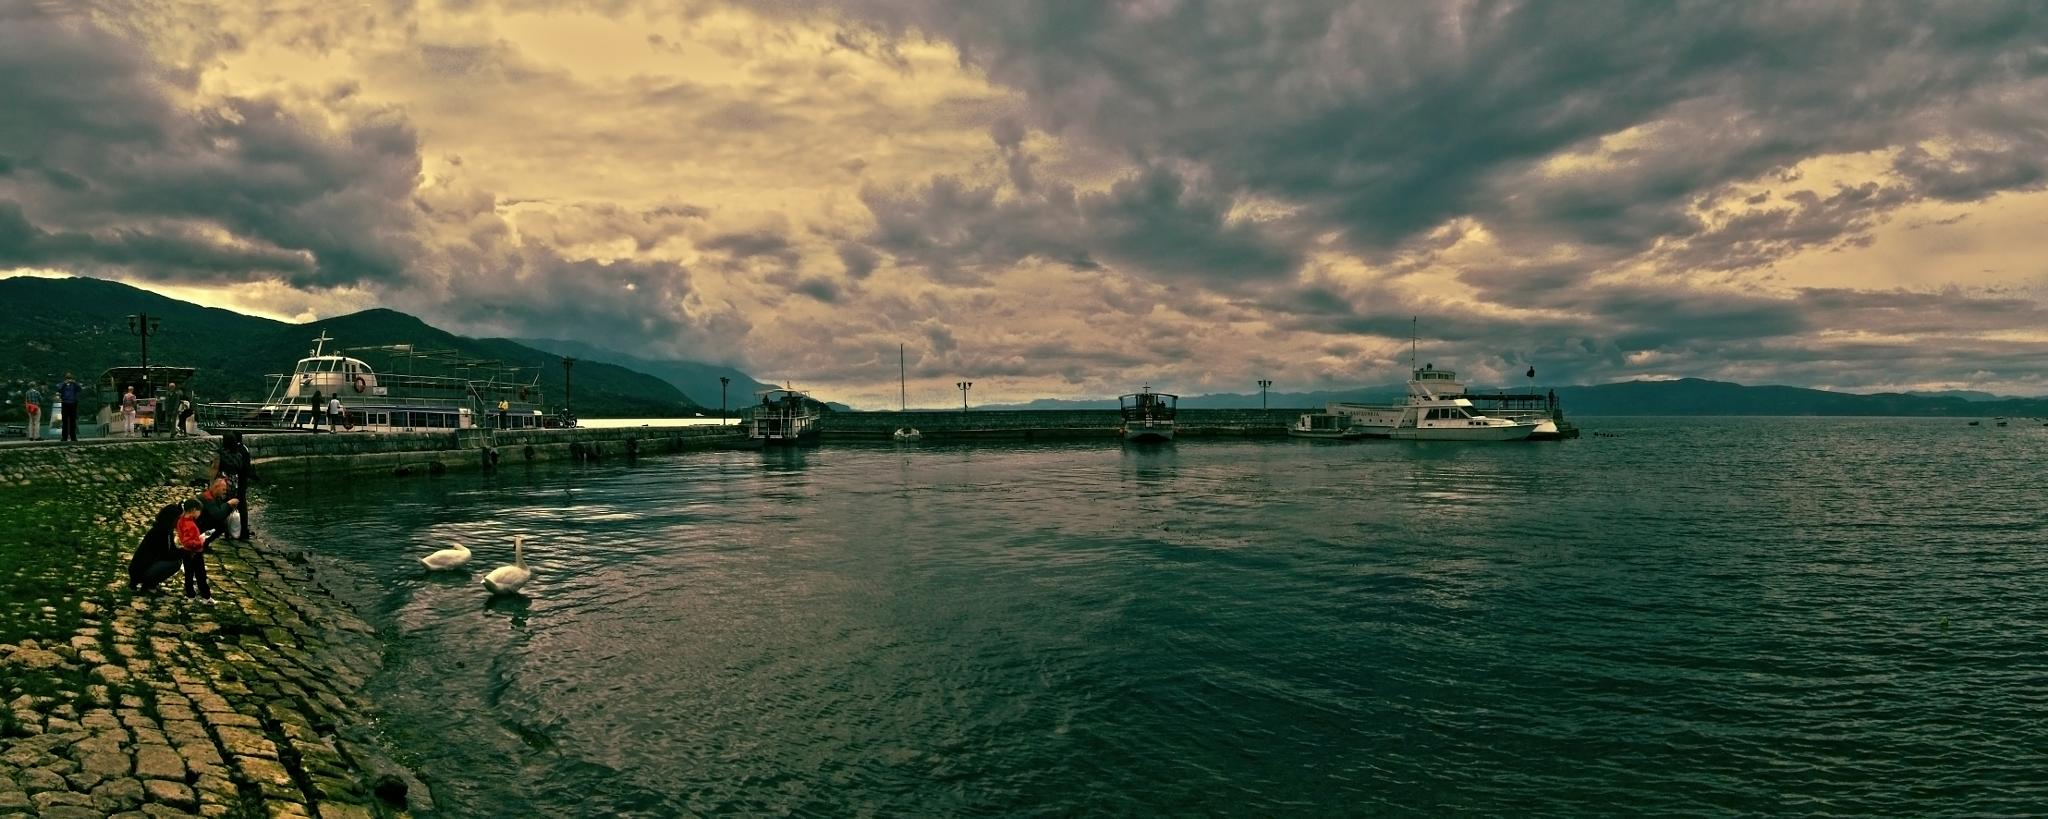 Ohrid port by dimce.korunoski